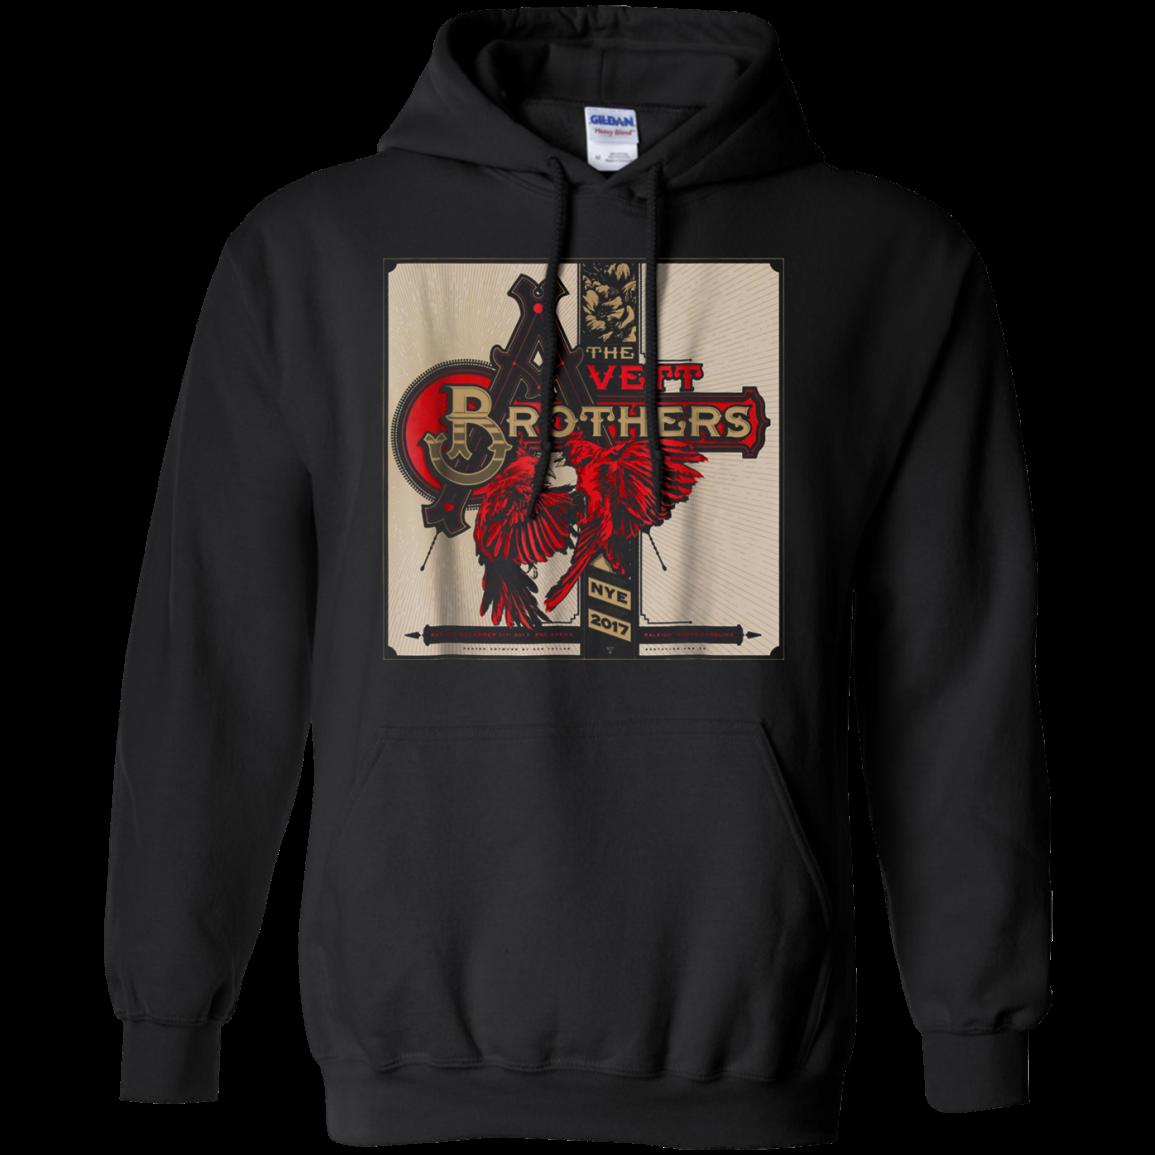 The Avett Brothers Shirt